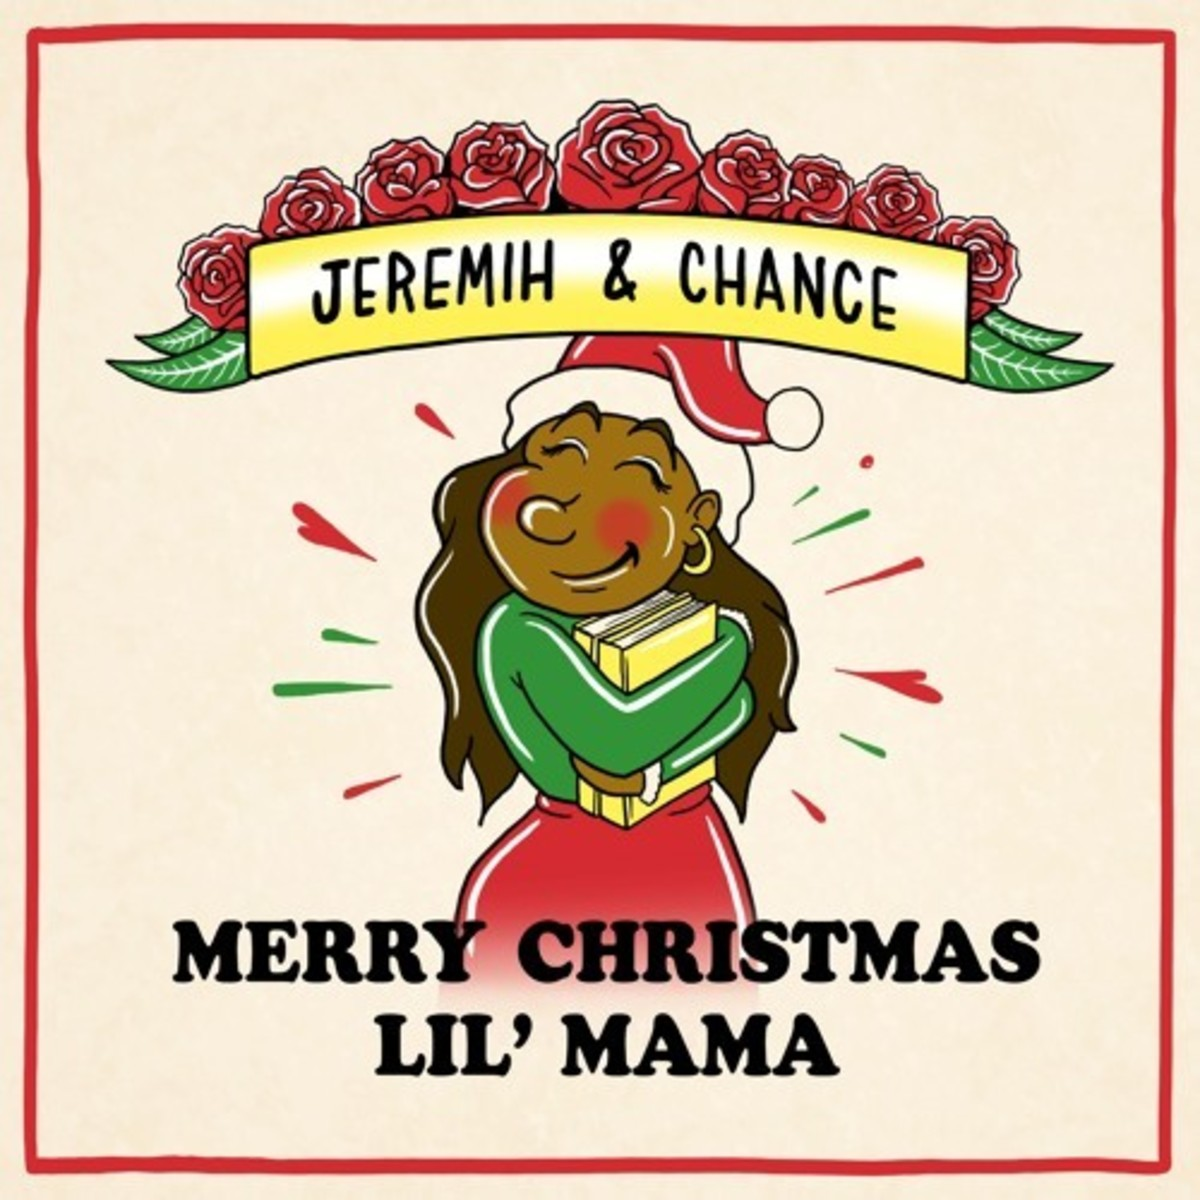 jeremih-chance-merry-christmas-lil-mama.jpg